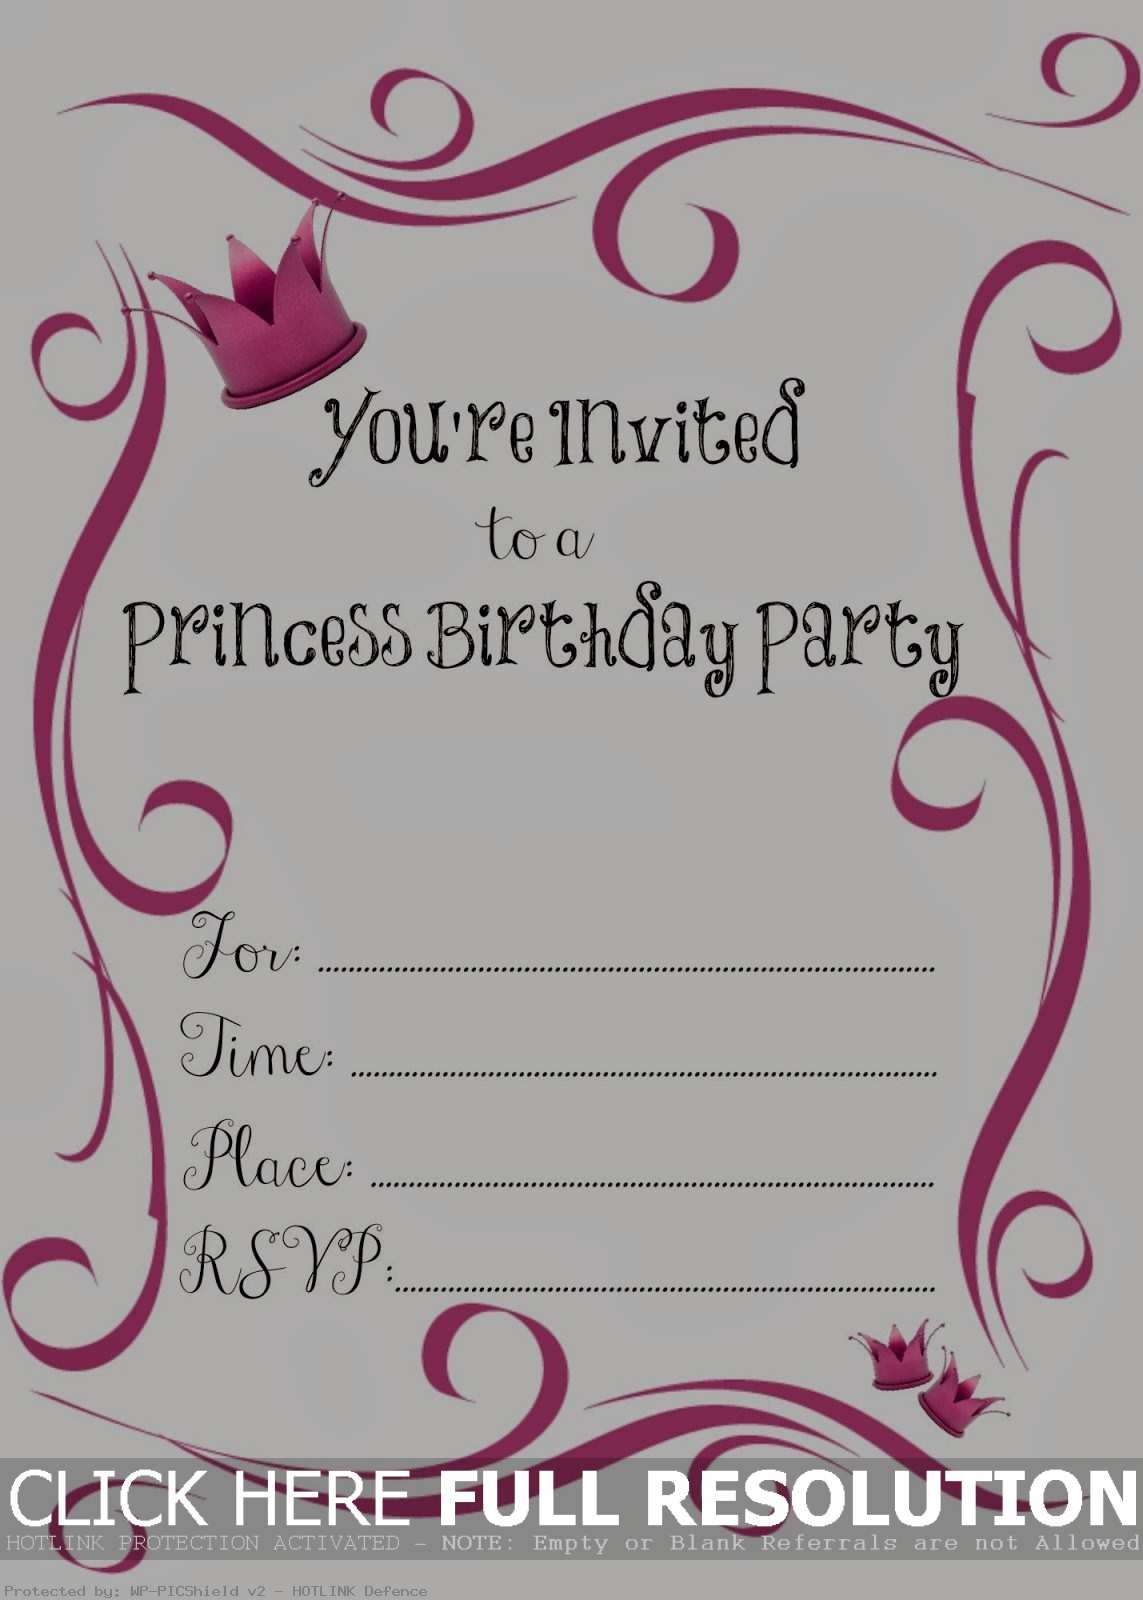 Princess Birthday Invitation Blank - American Girl Party Invitations Free Printable